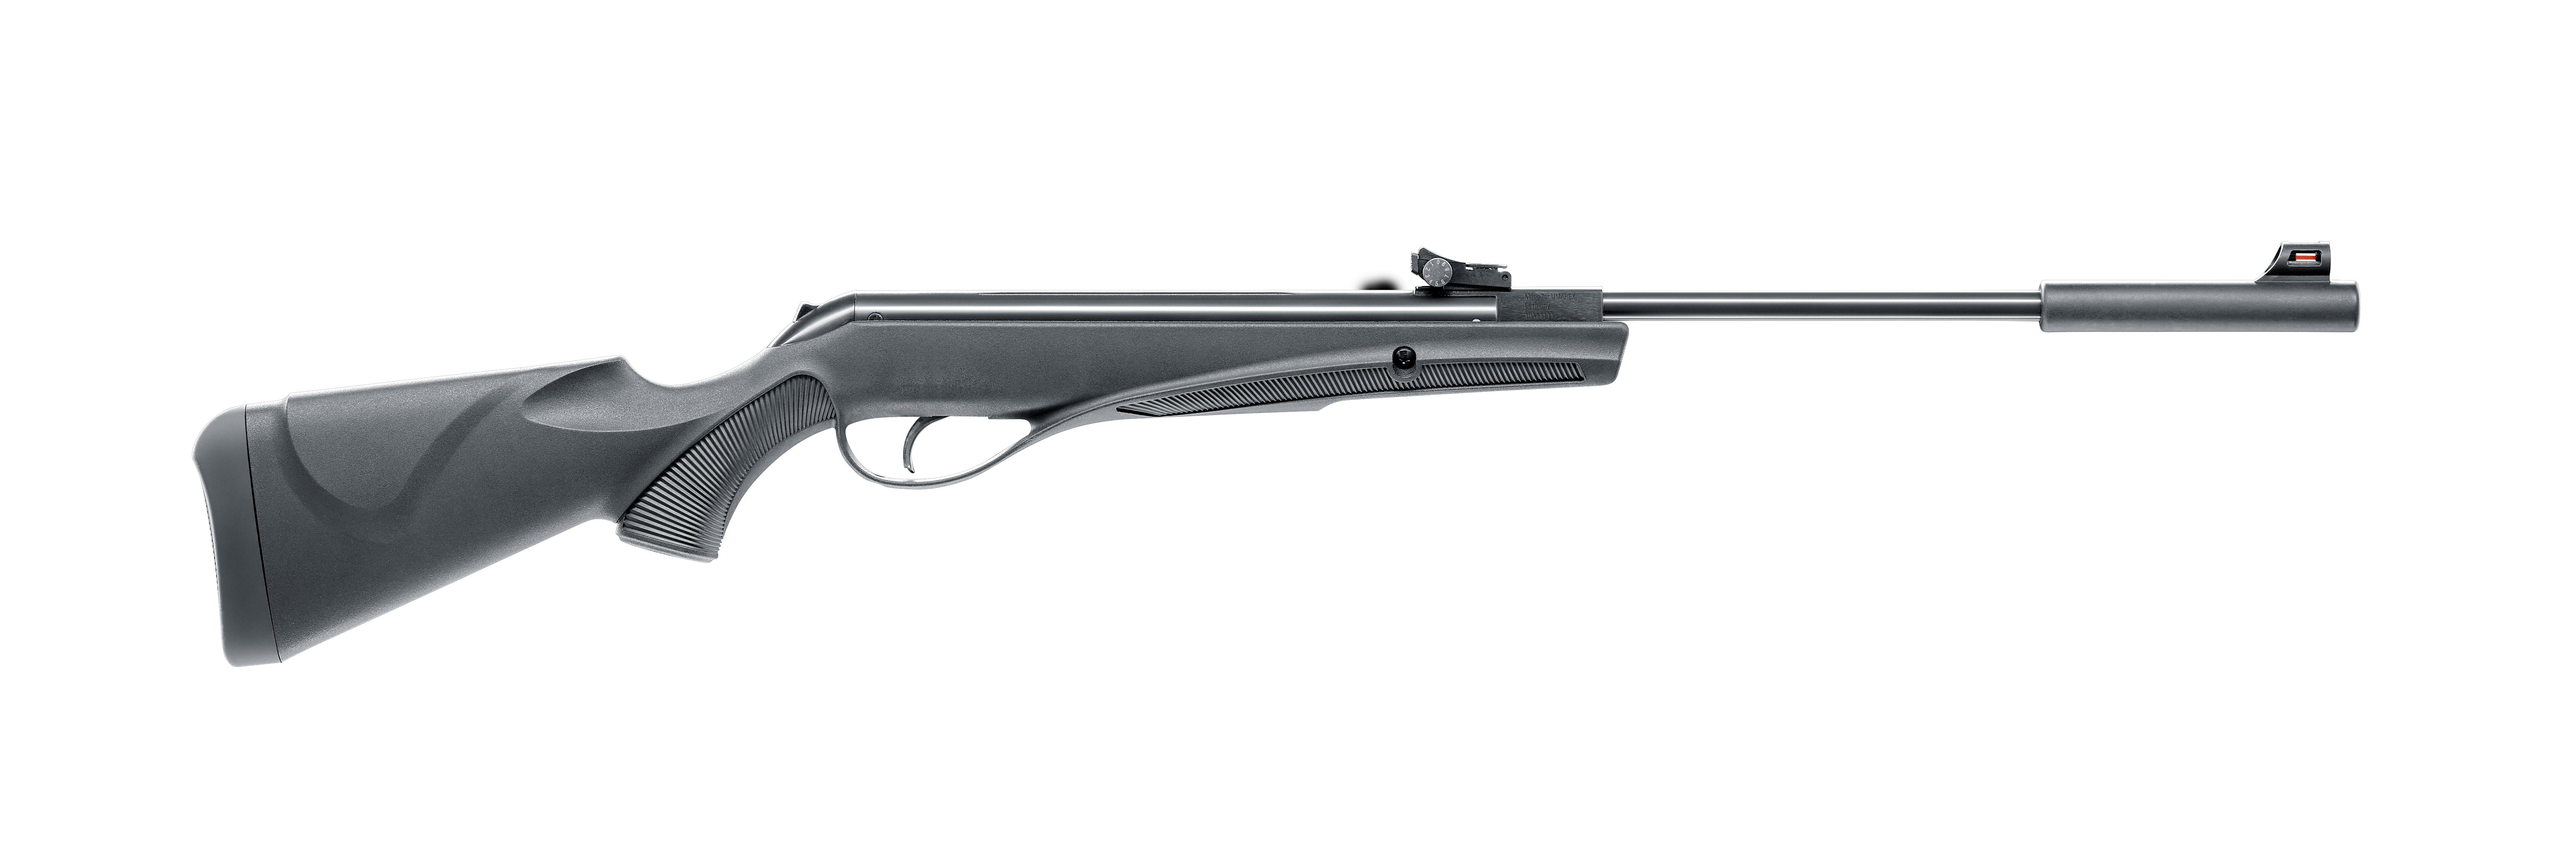 PERFECTA (Umarex) Airgun RS30 4.5 mm .177